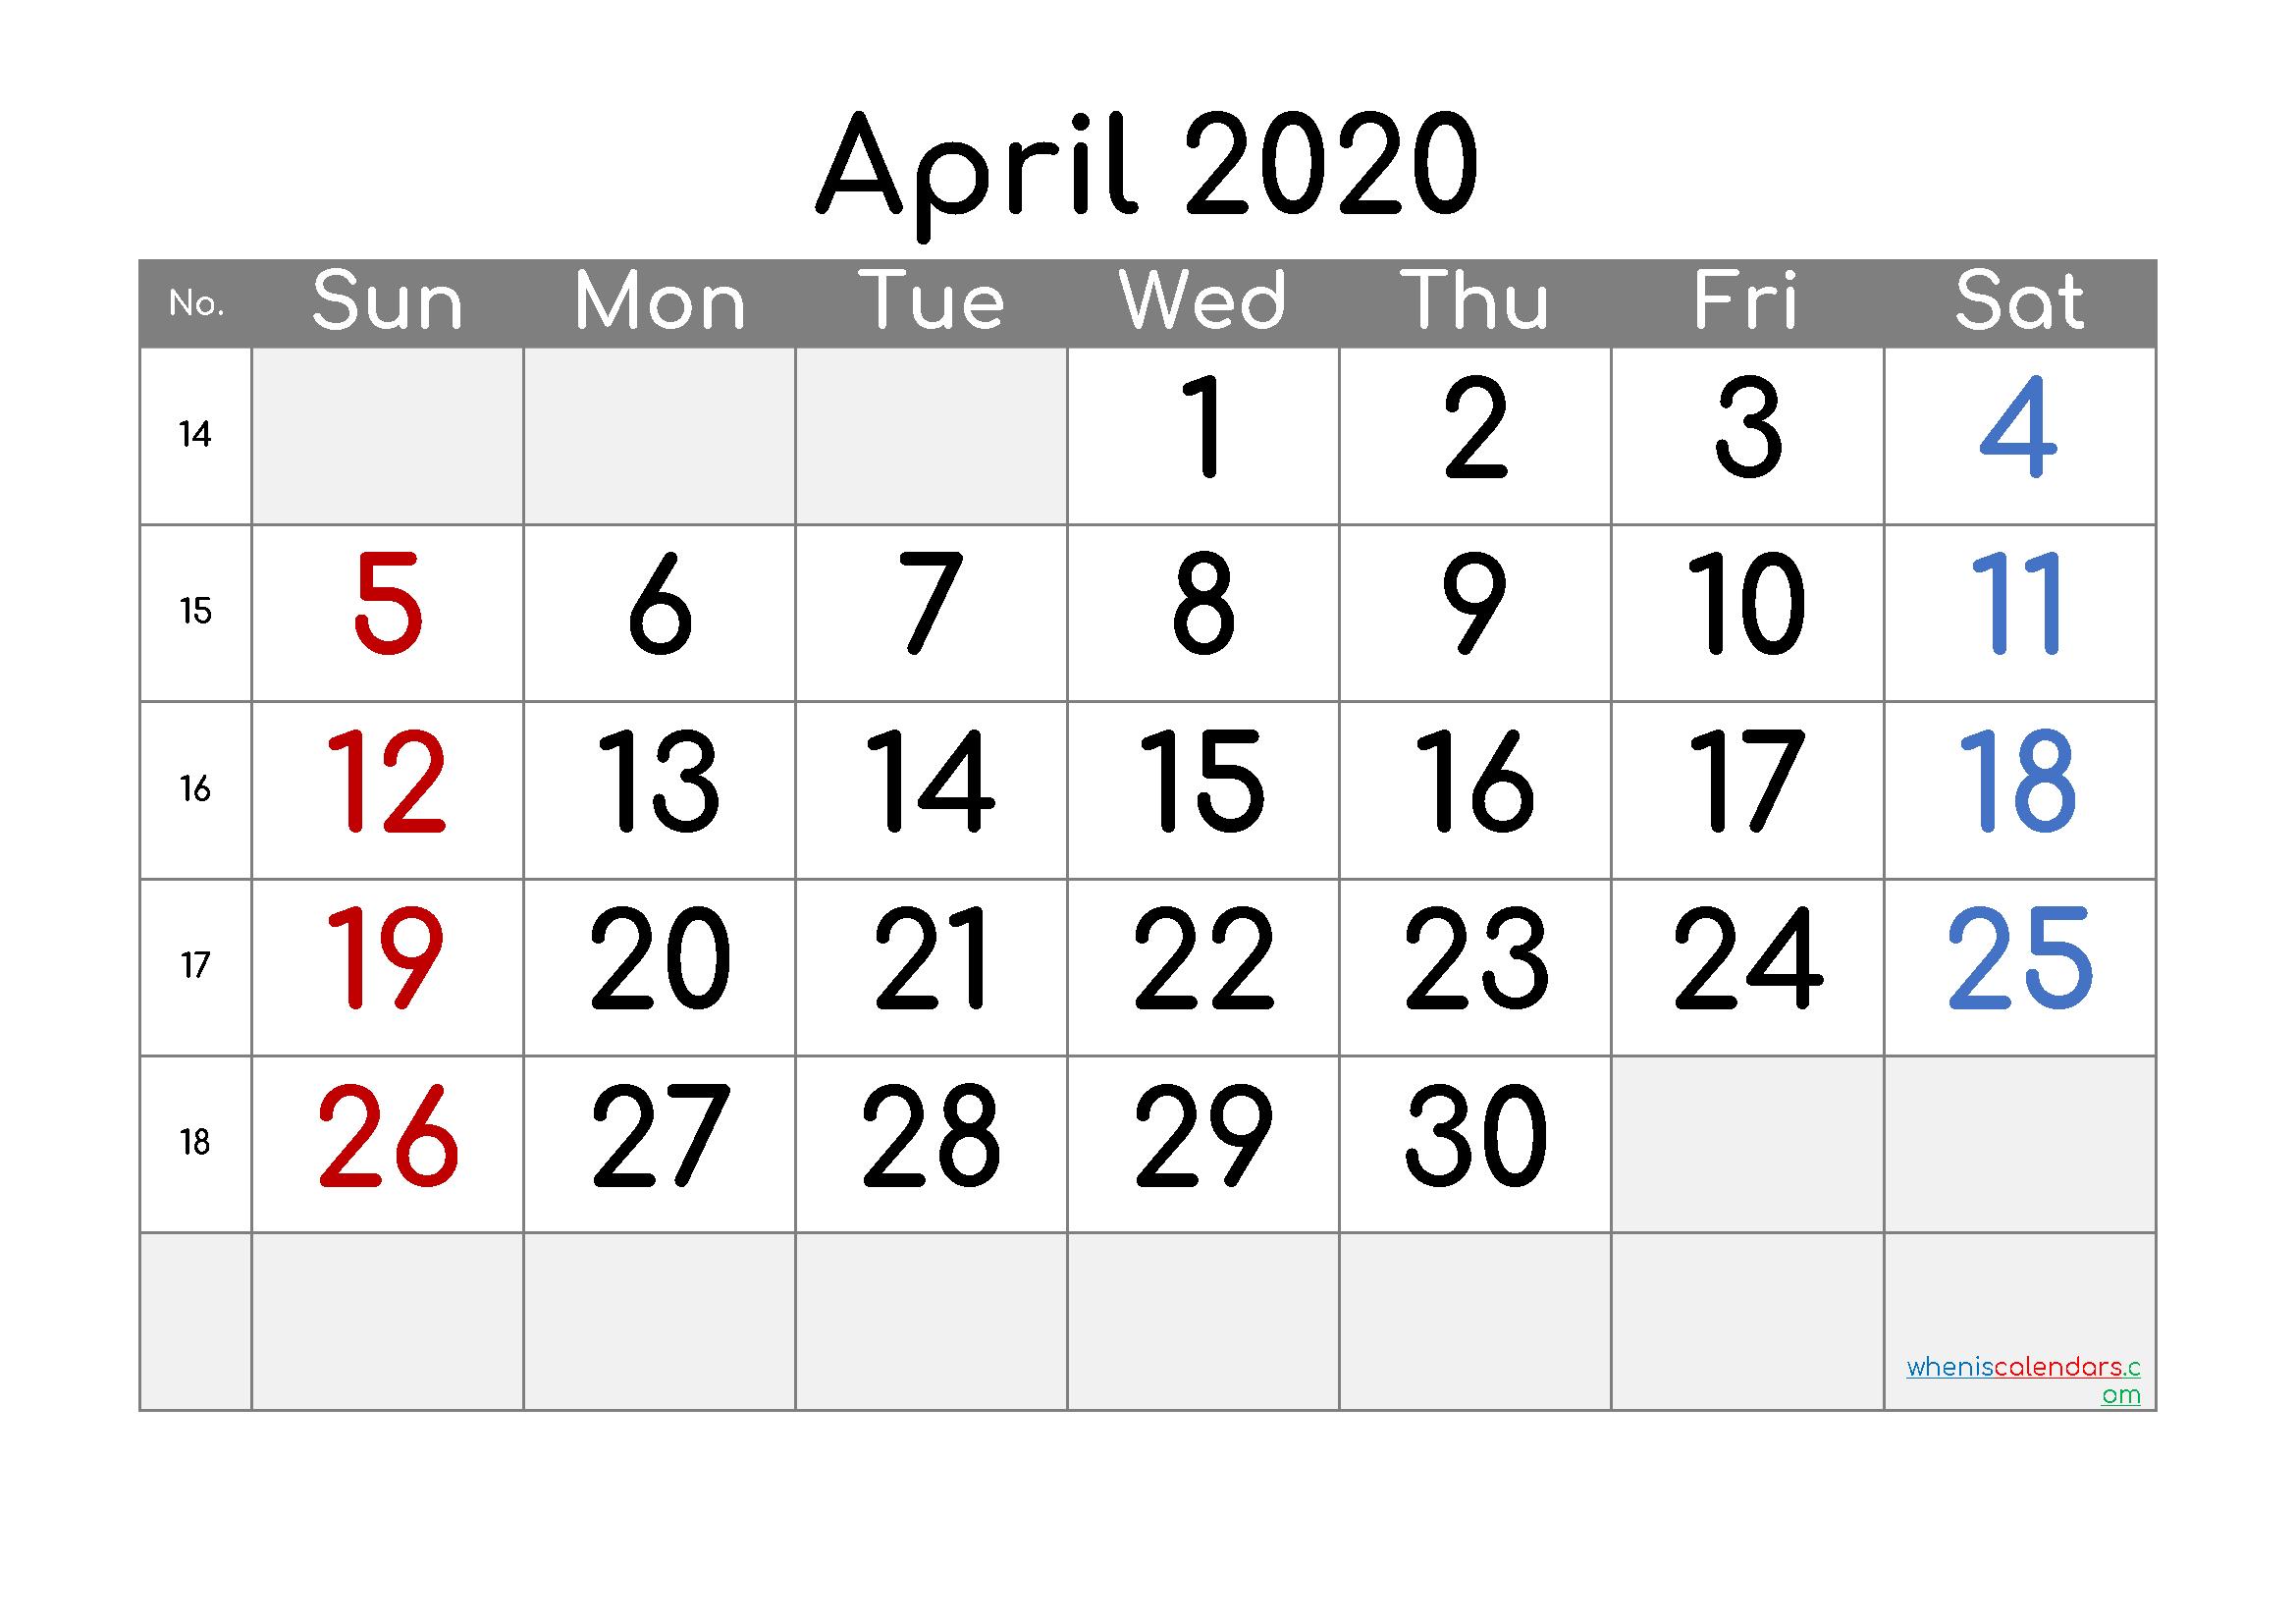 Free Printable Calendar 2020 April - Free Printable Monthly Free Printable Calendars 8 Week